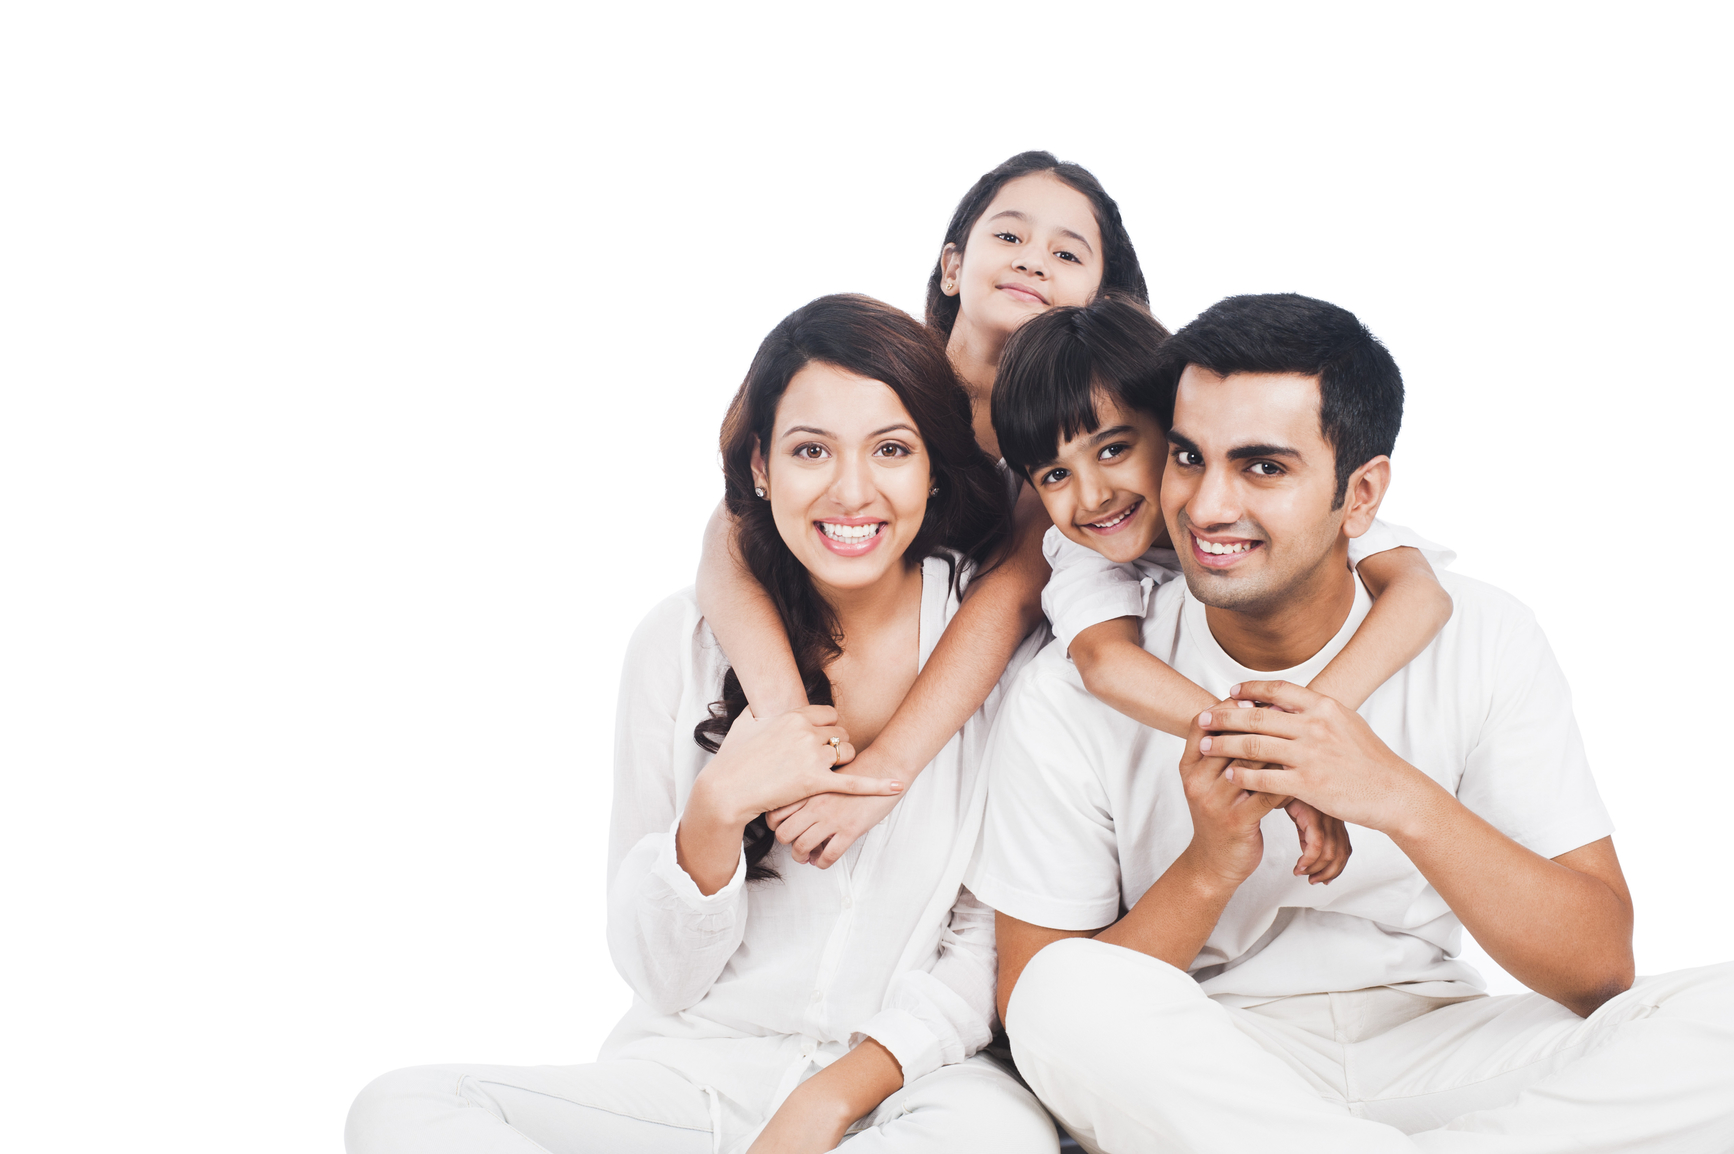 stockfresh_6224774_portrait-of-a-happy-family-smiling_sizeM_336c62